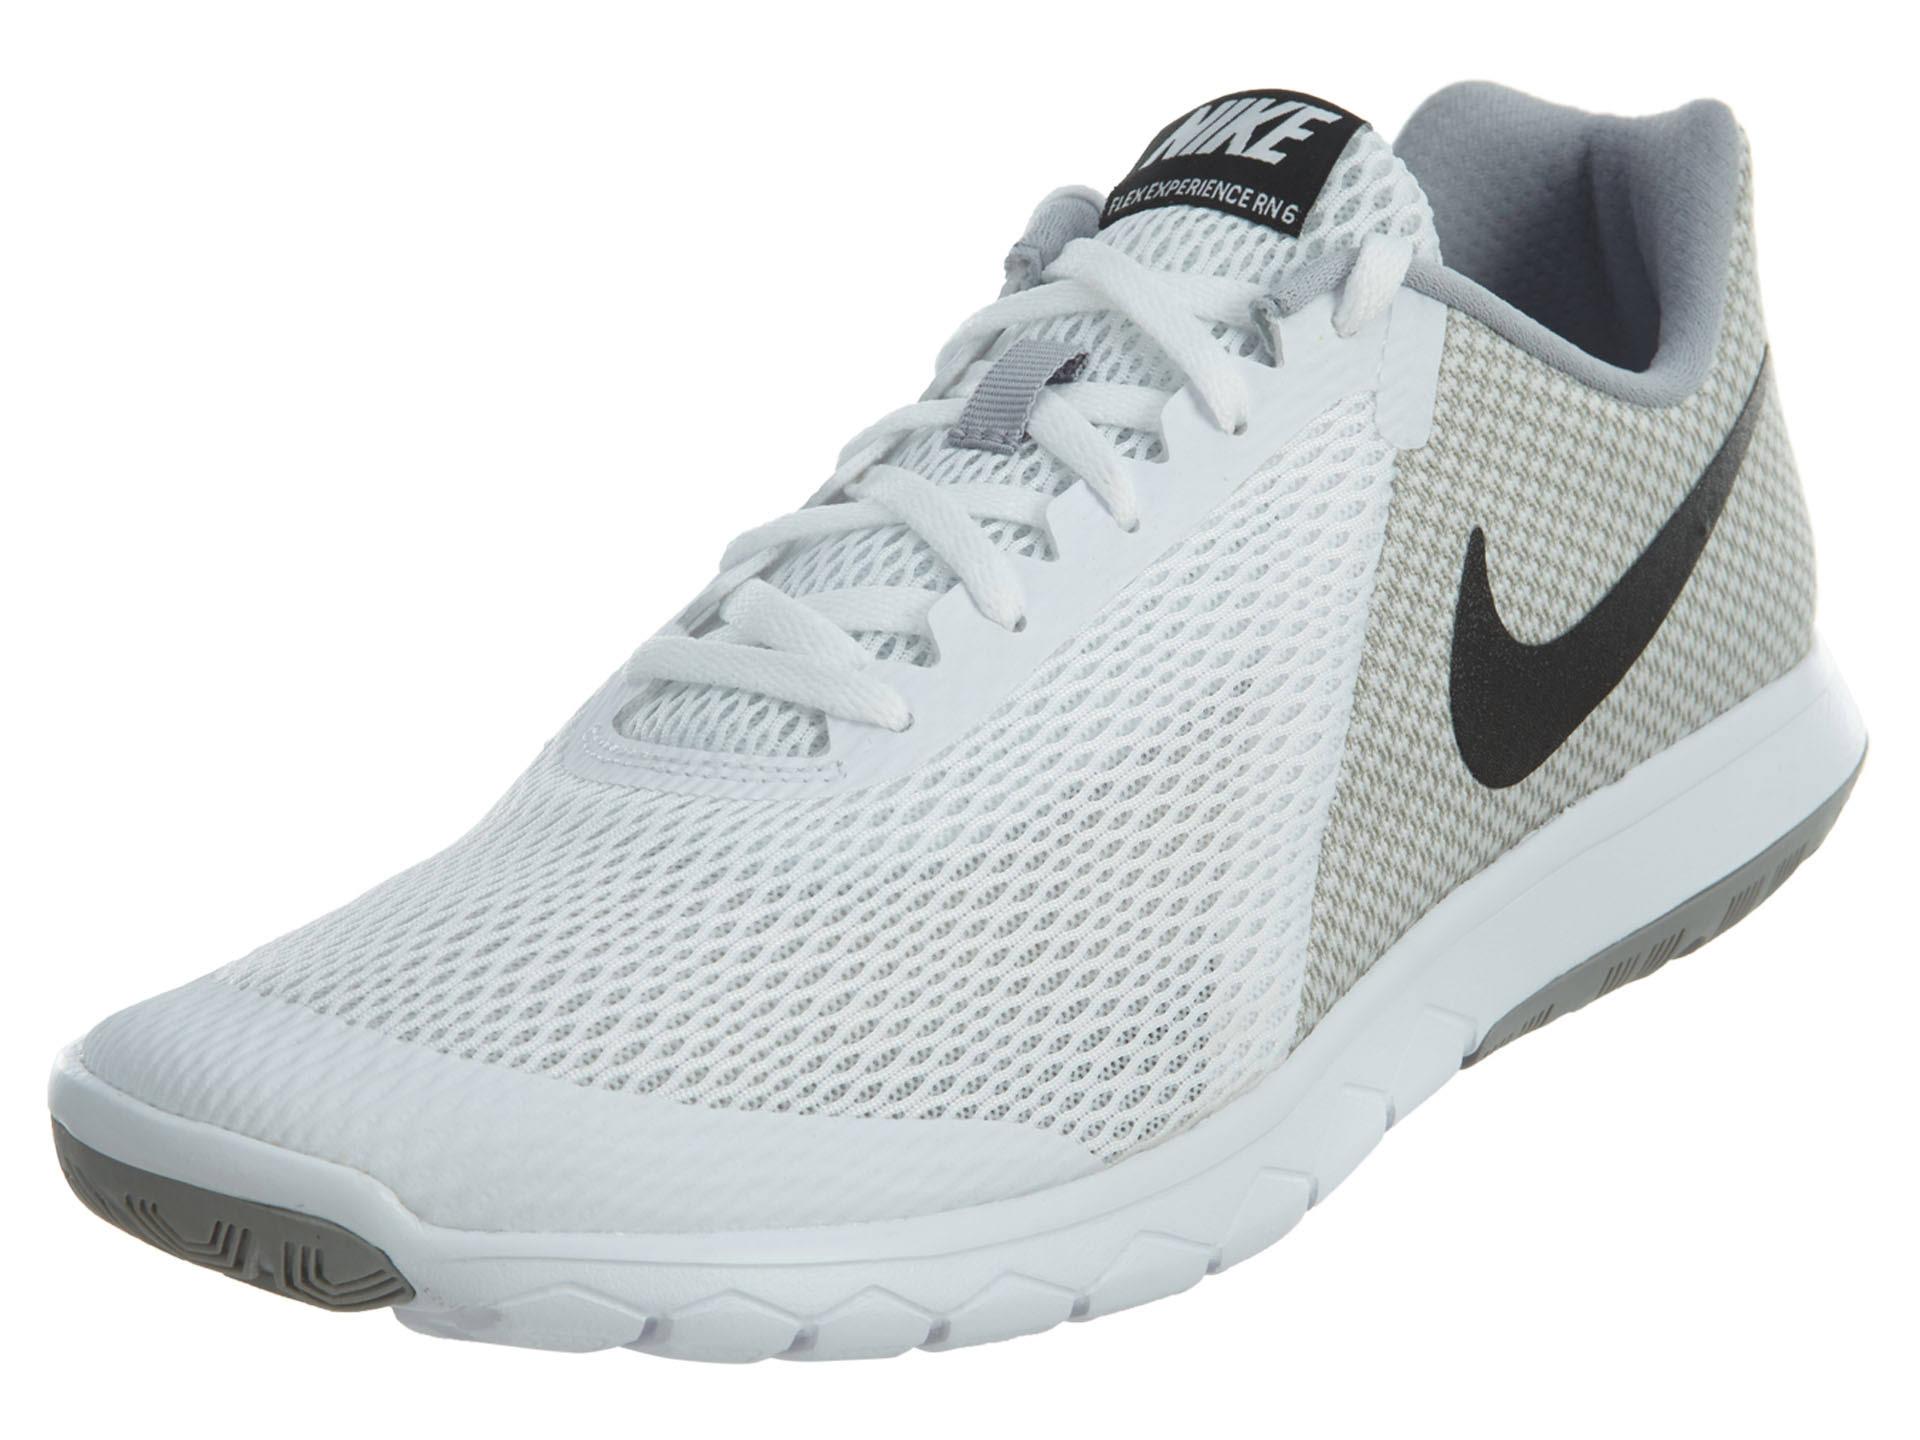 Rn 100 White Mens Experience wolf Nike Flex 881802 Gray 6 Black Style qCwWSgHE